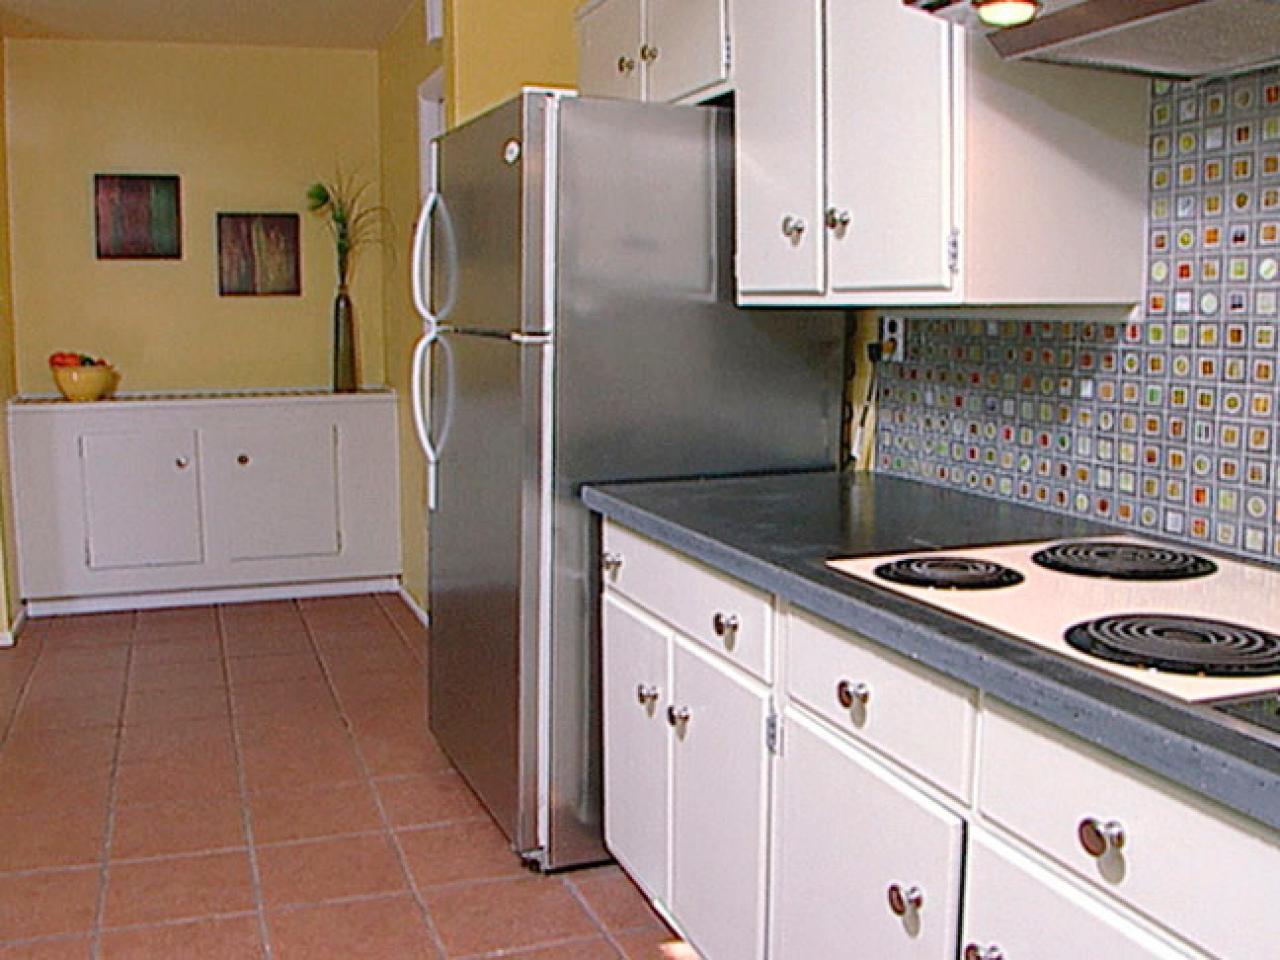 Uncategorized Where To Buy Cheap Kitchen Appliances kitchen appliance buying guide hgtv cheap basic appliances